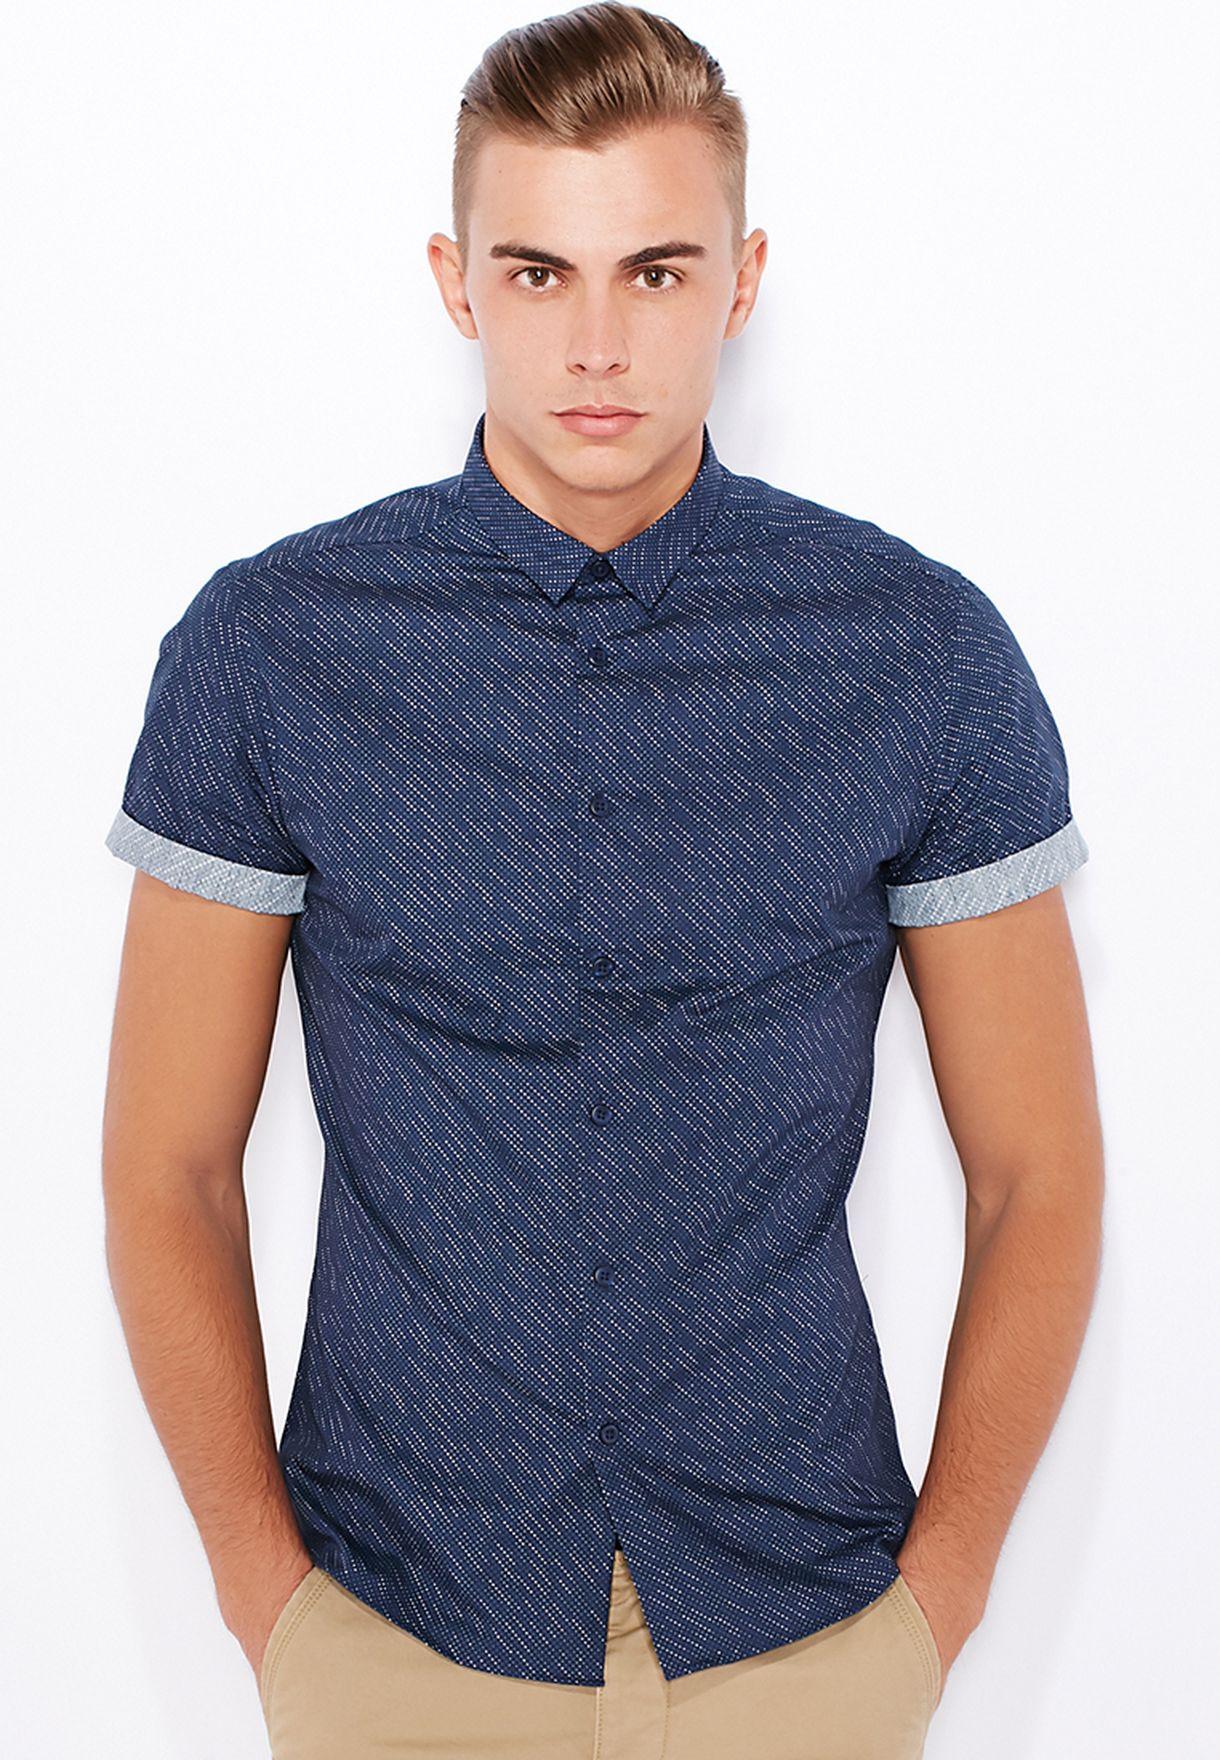 fa94f2e25 Shop Topman blue Bali Dot Slim Fit Shirt 84G35JNAV for Men in Saudi ...